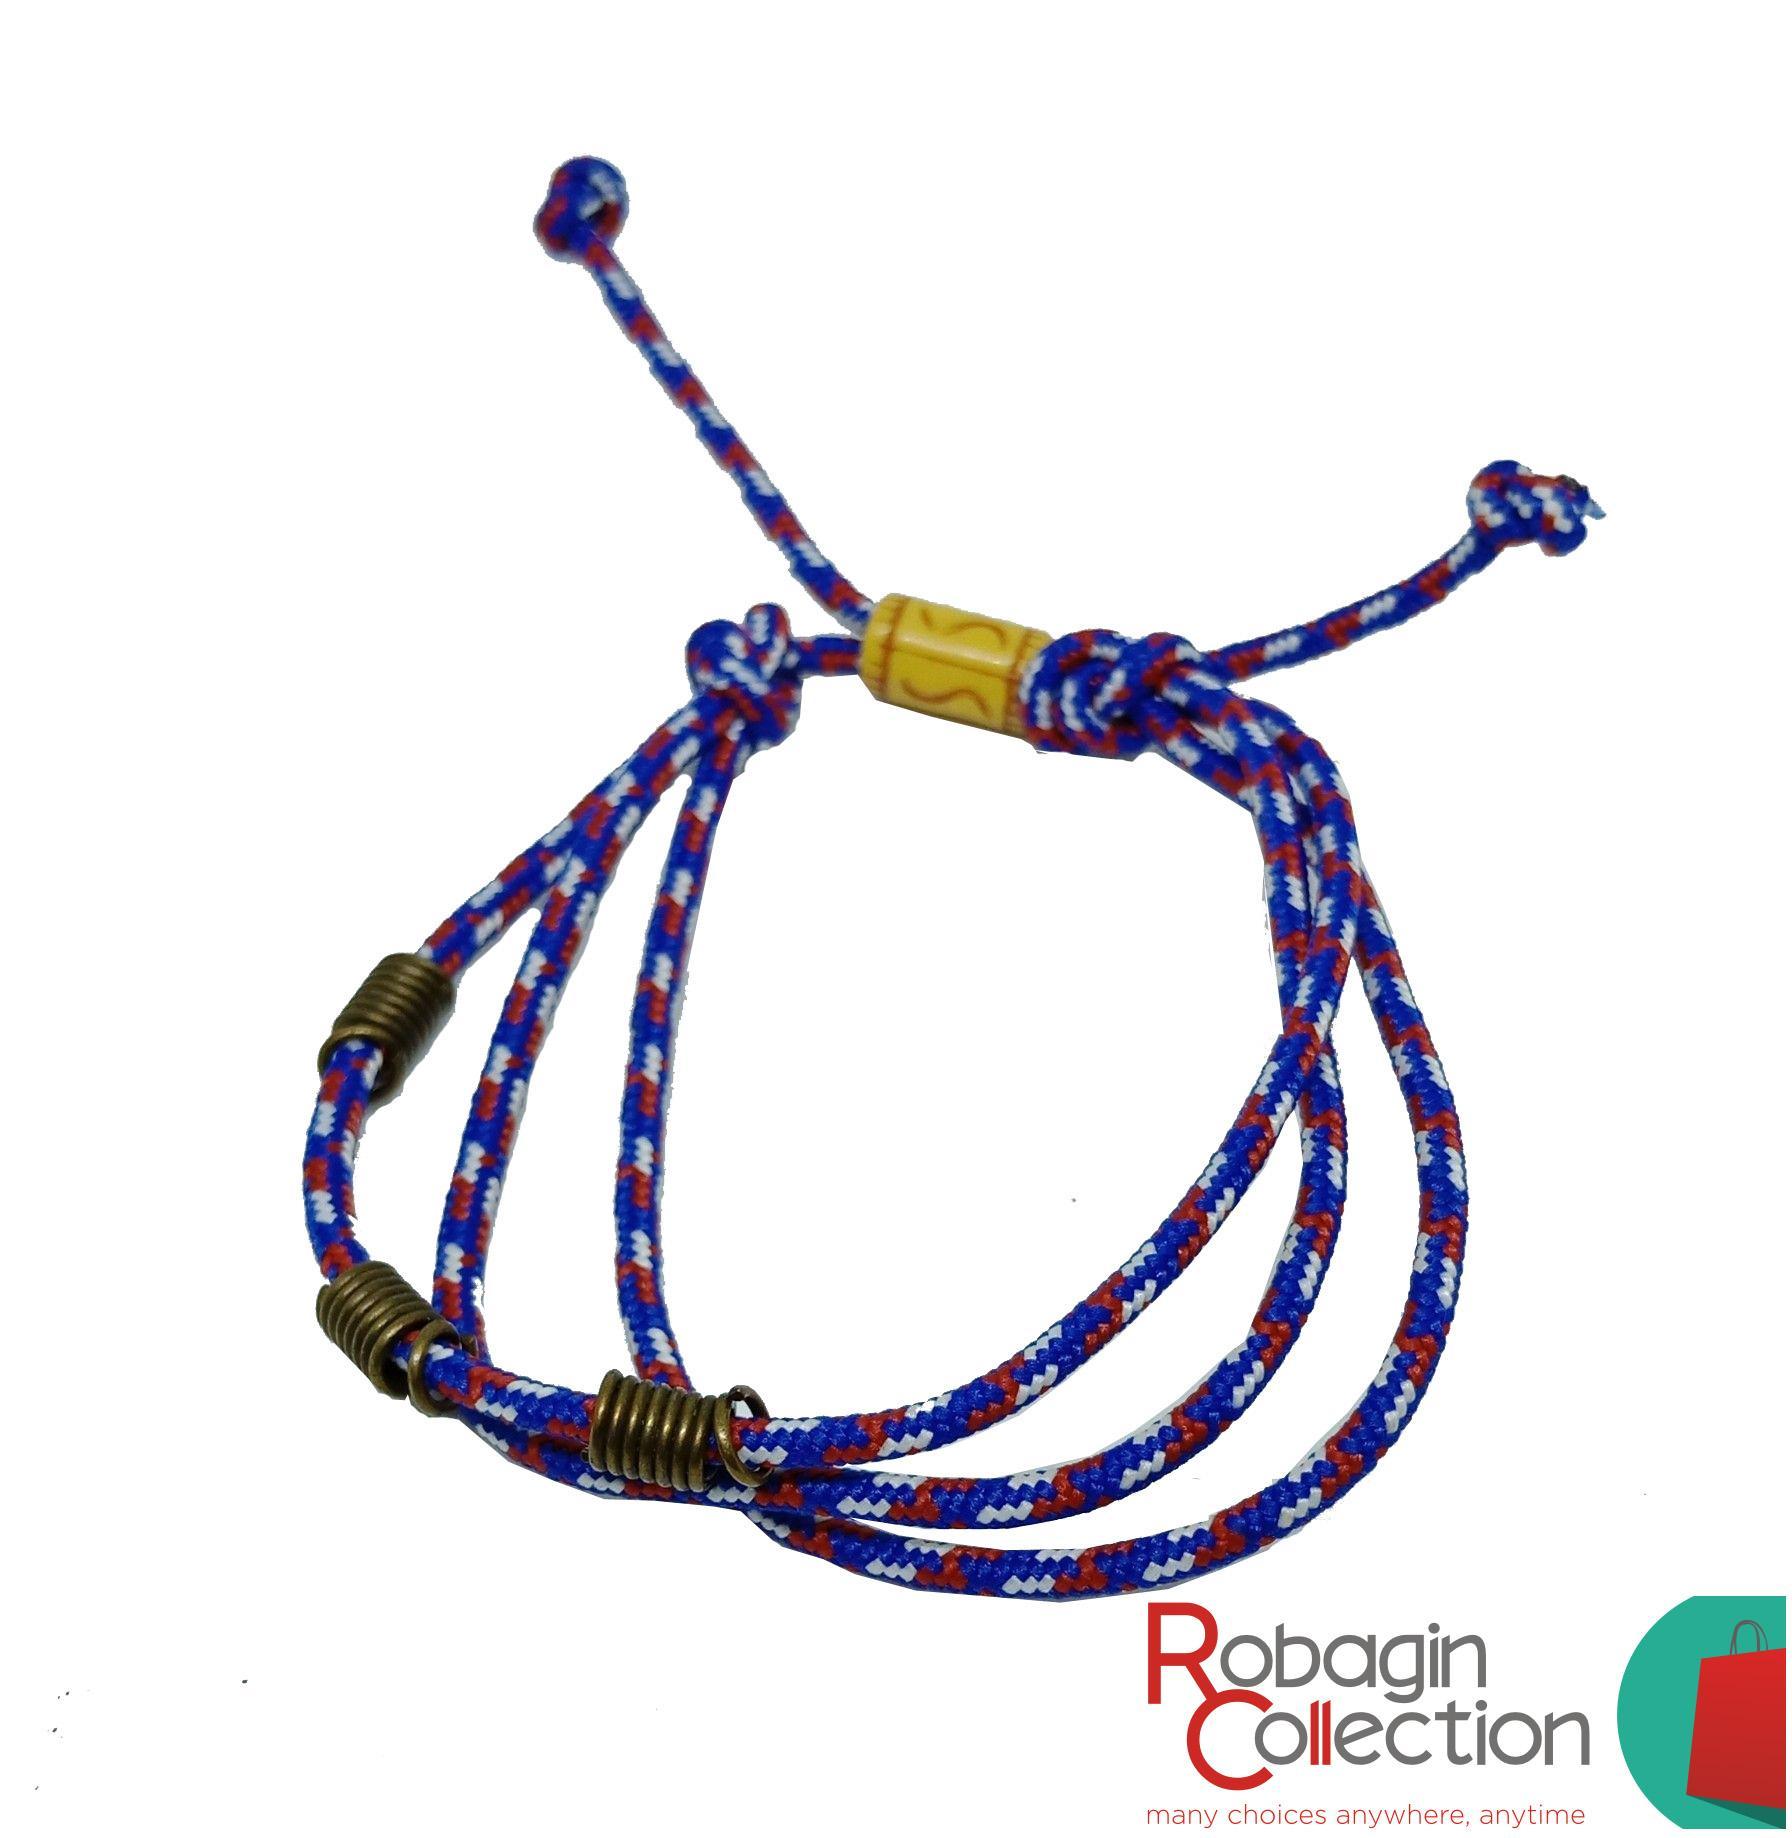 Robagin gelang tali warna warni Glp12